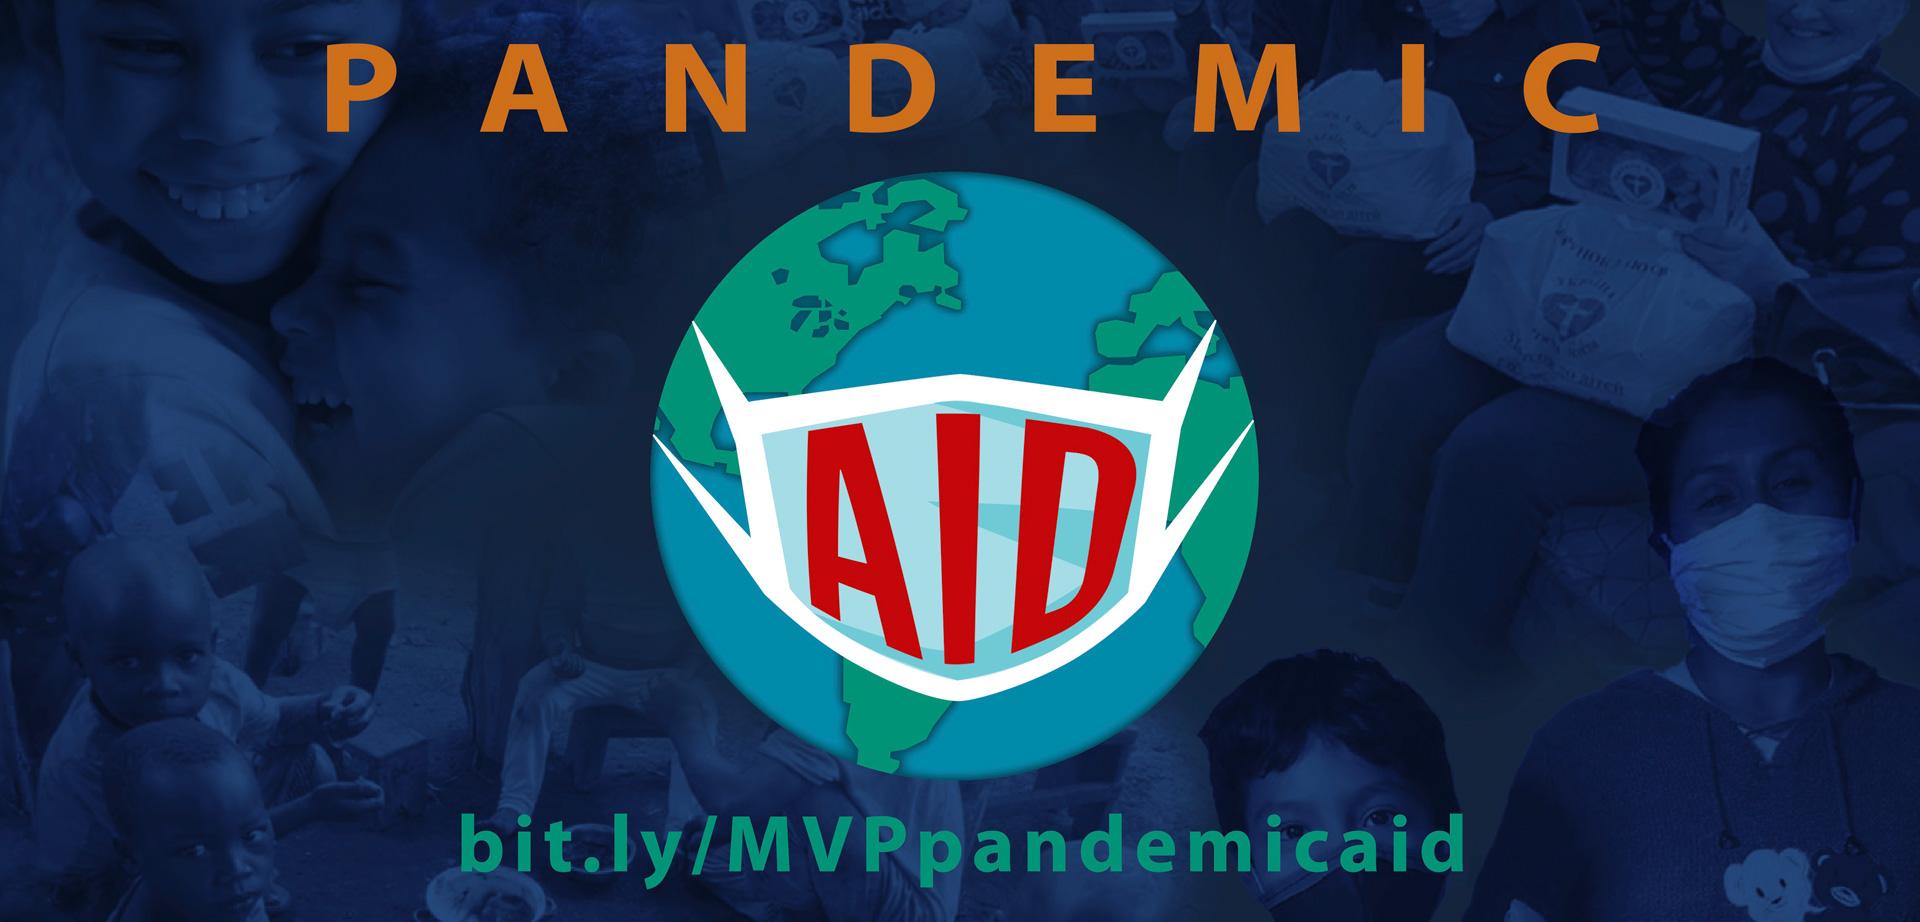 PandemicAid-AD